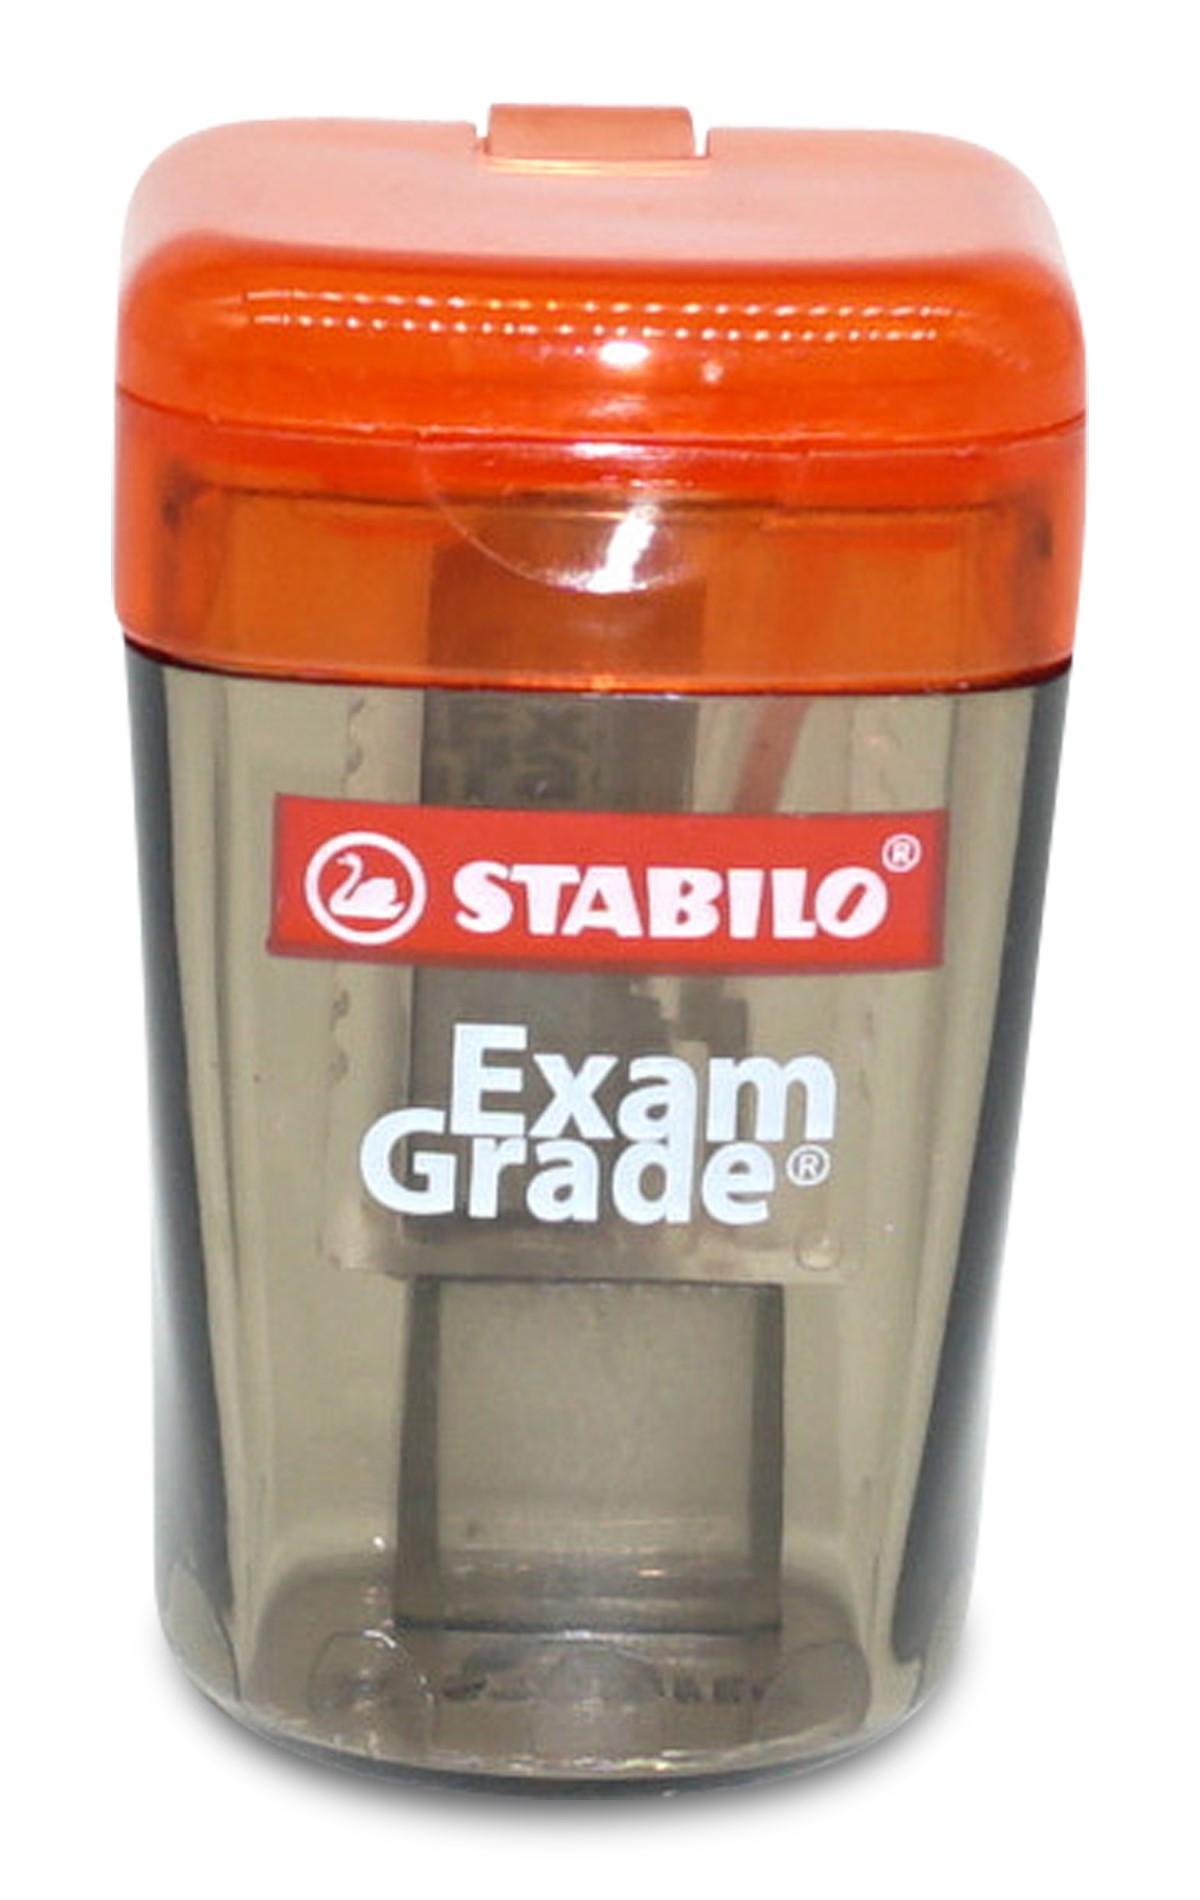 Stabilo Exam Grade Spitzerdose